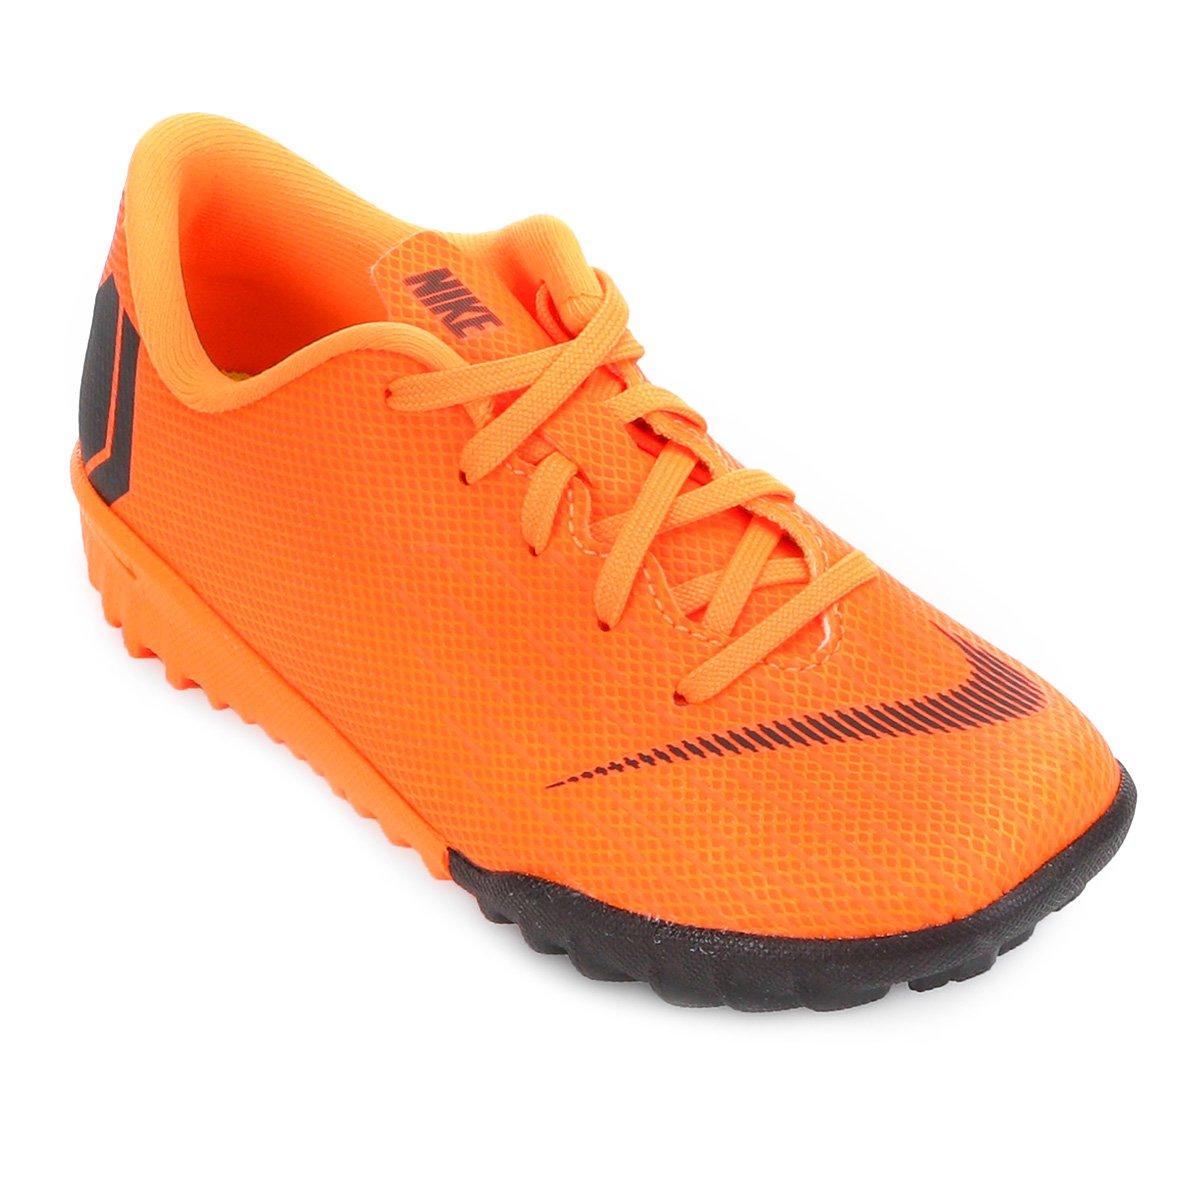 d416e9c995 Chuteira Society Infantil Nike Mercurial Vapor 12 Academy - Compre ...